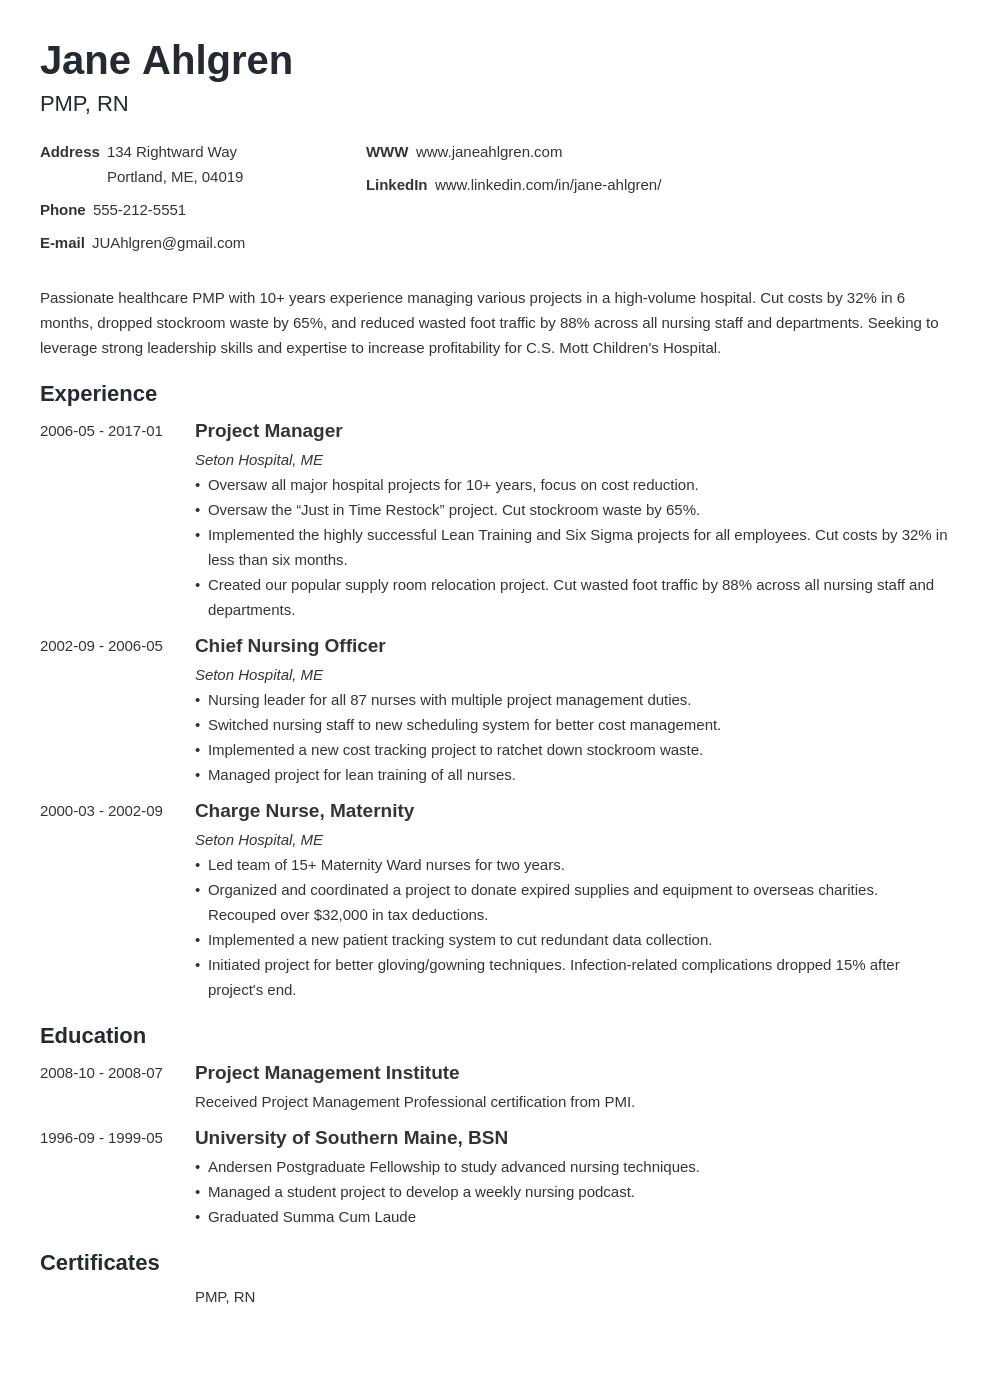 Plain Text Resume Example Template Minimo Resume Examples Job Resume Examples Resume Layout